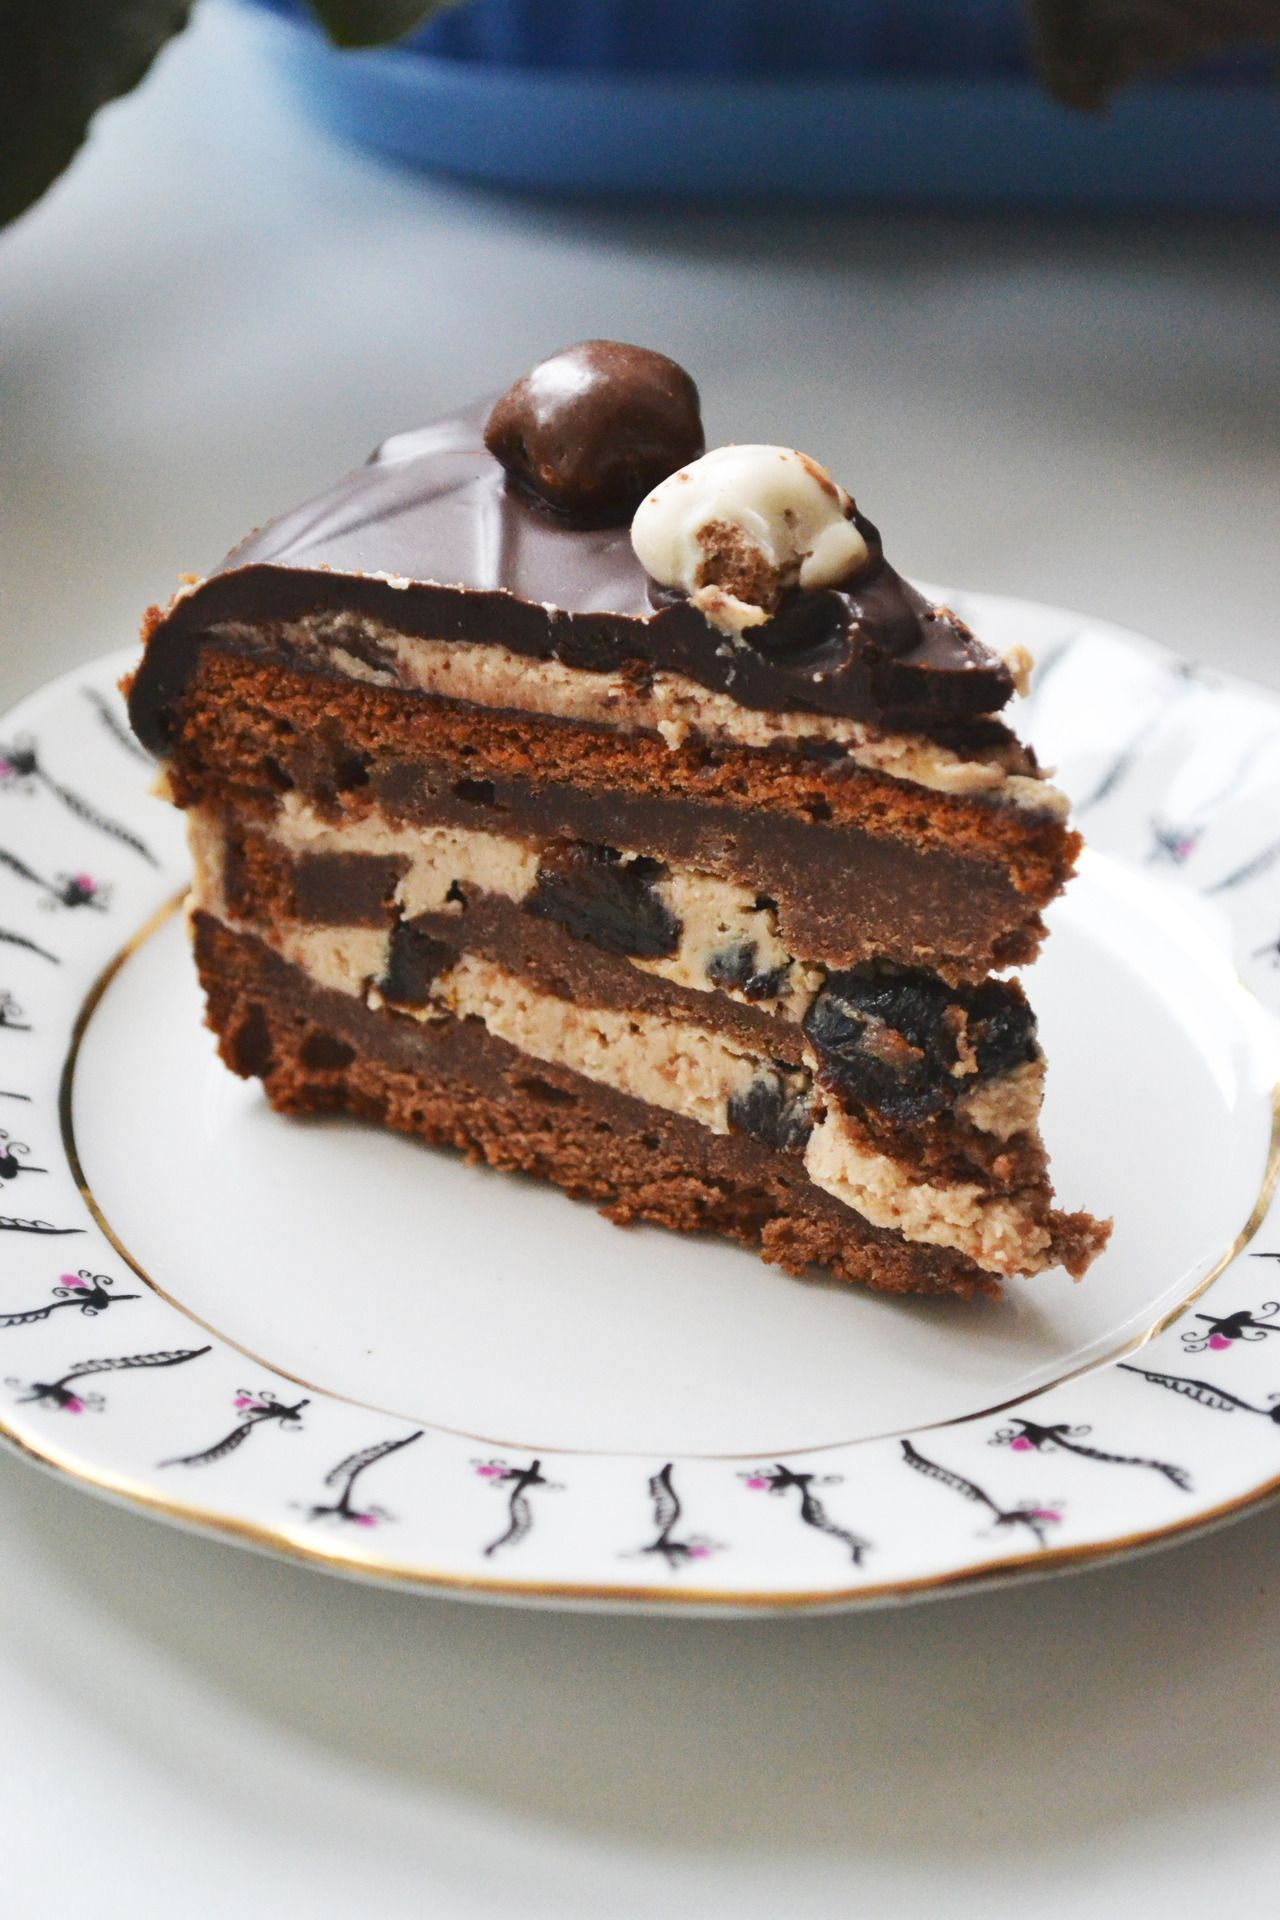 торт безе шоколад в черносливе рецепт